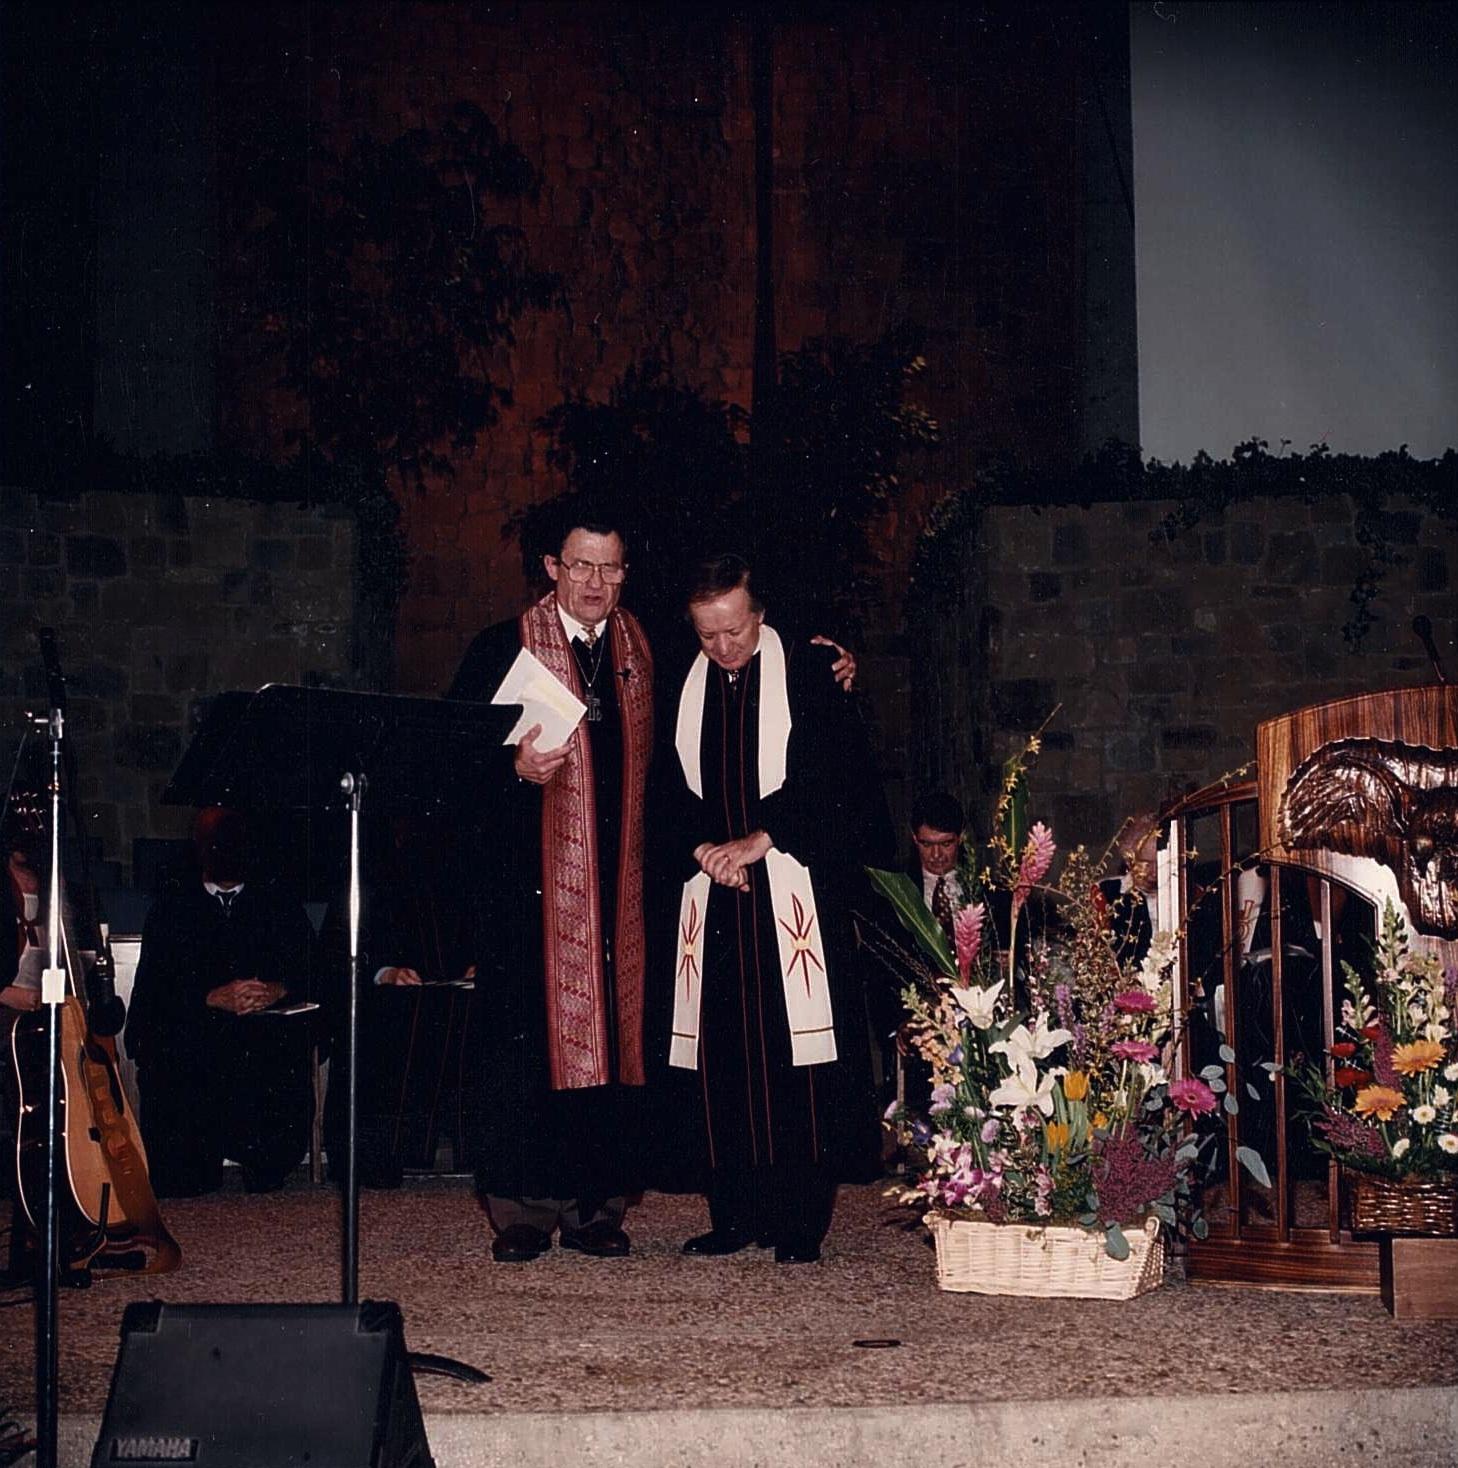 Rev.Echard Kraska installing Rev.Djambazian at GPC.jpg